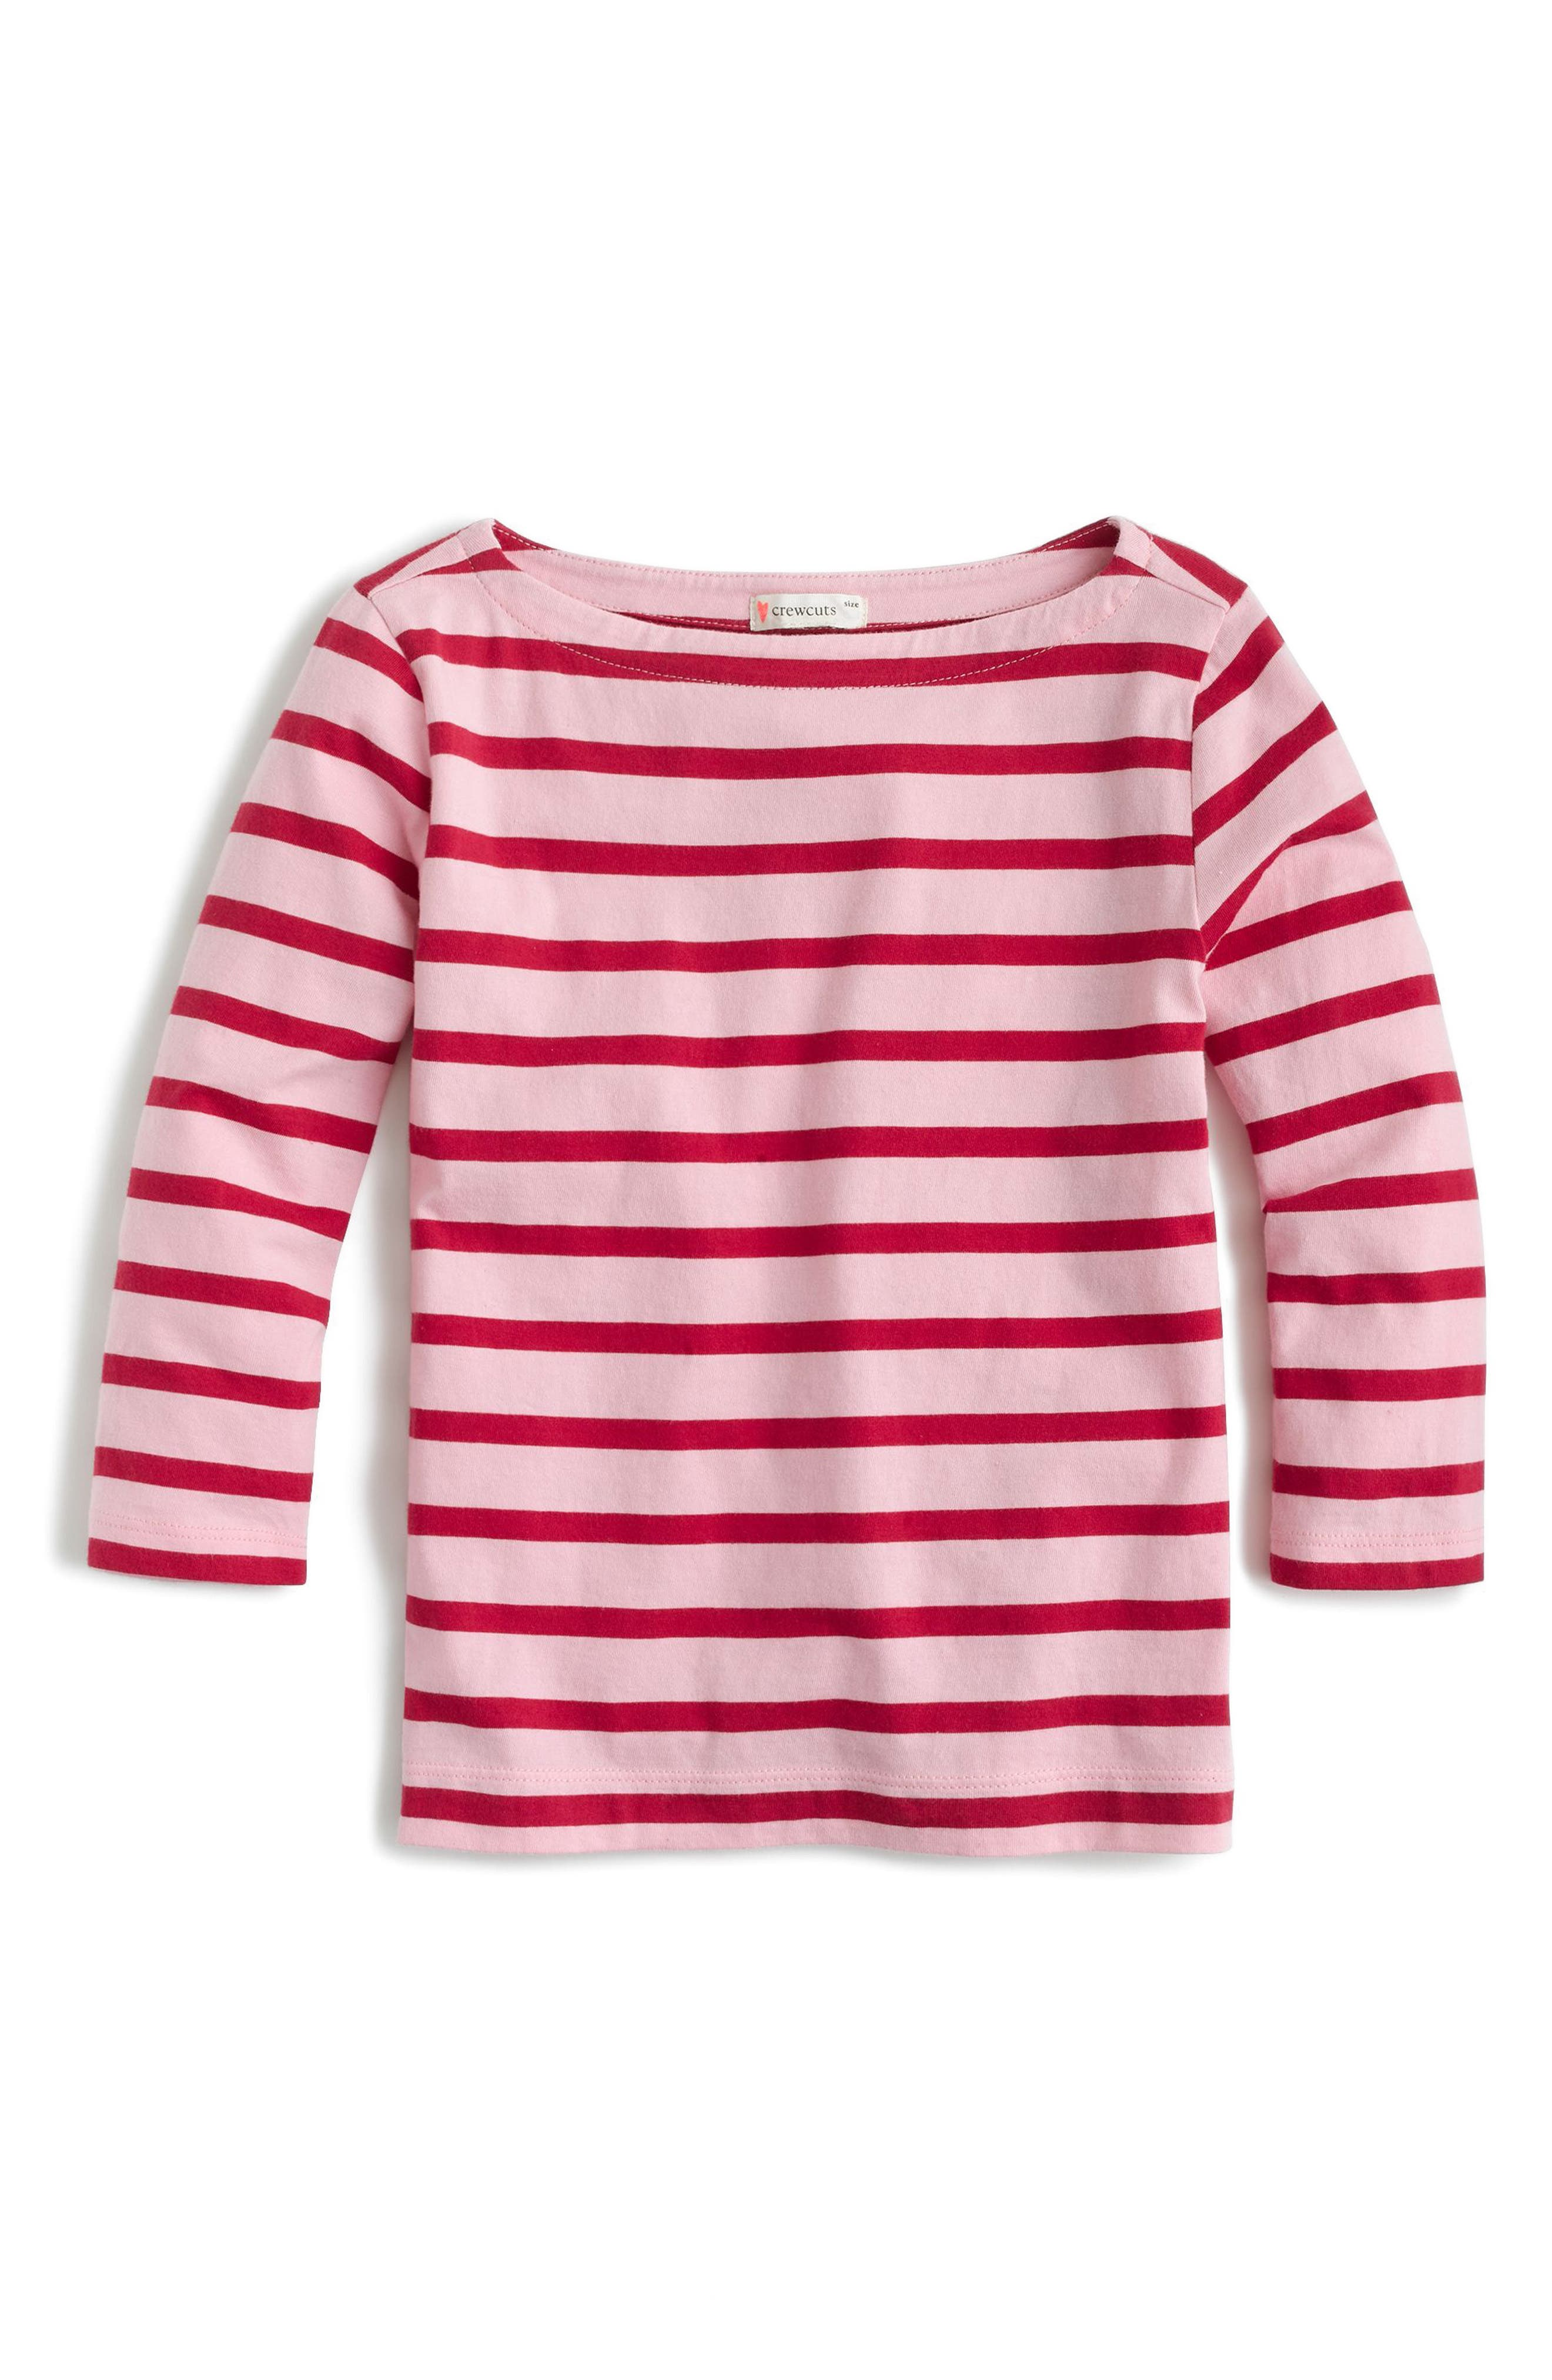 Alternate Image 1 Selected - crewcuts by J.Crew Classic Stripe T-Shirt (Toddler Girls, Little Girls & Big Girls)